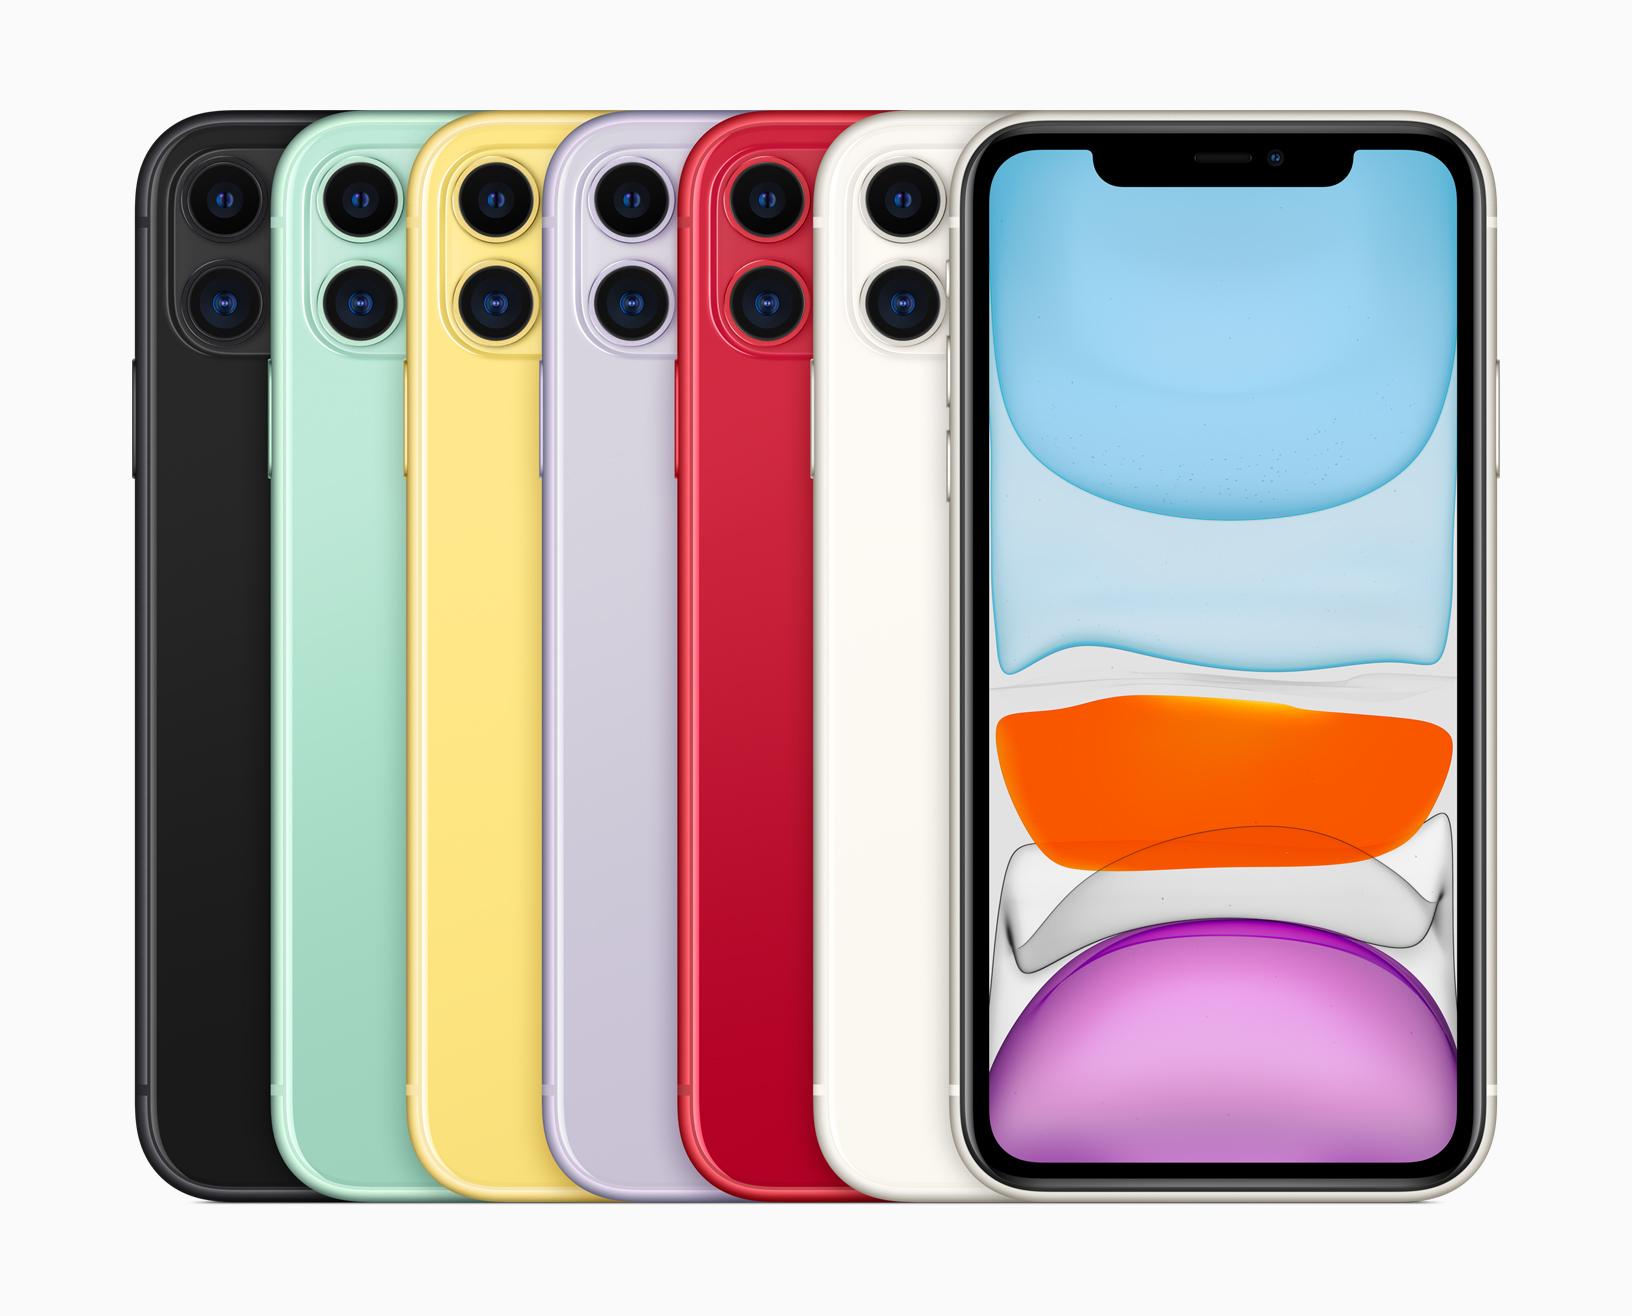 Apple_iphone_11-family-lineup-091019.jpg?mtime=20190923091823#asset:106915